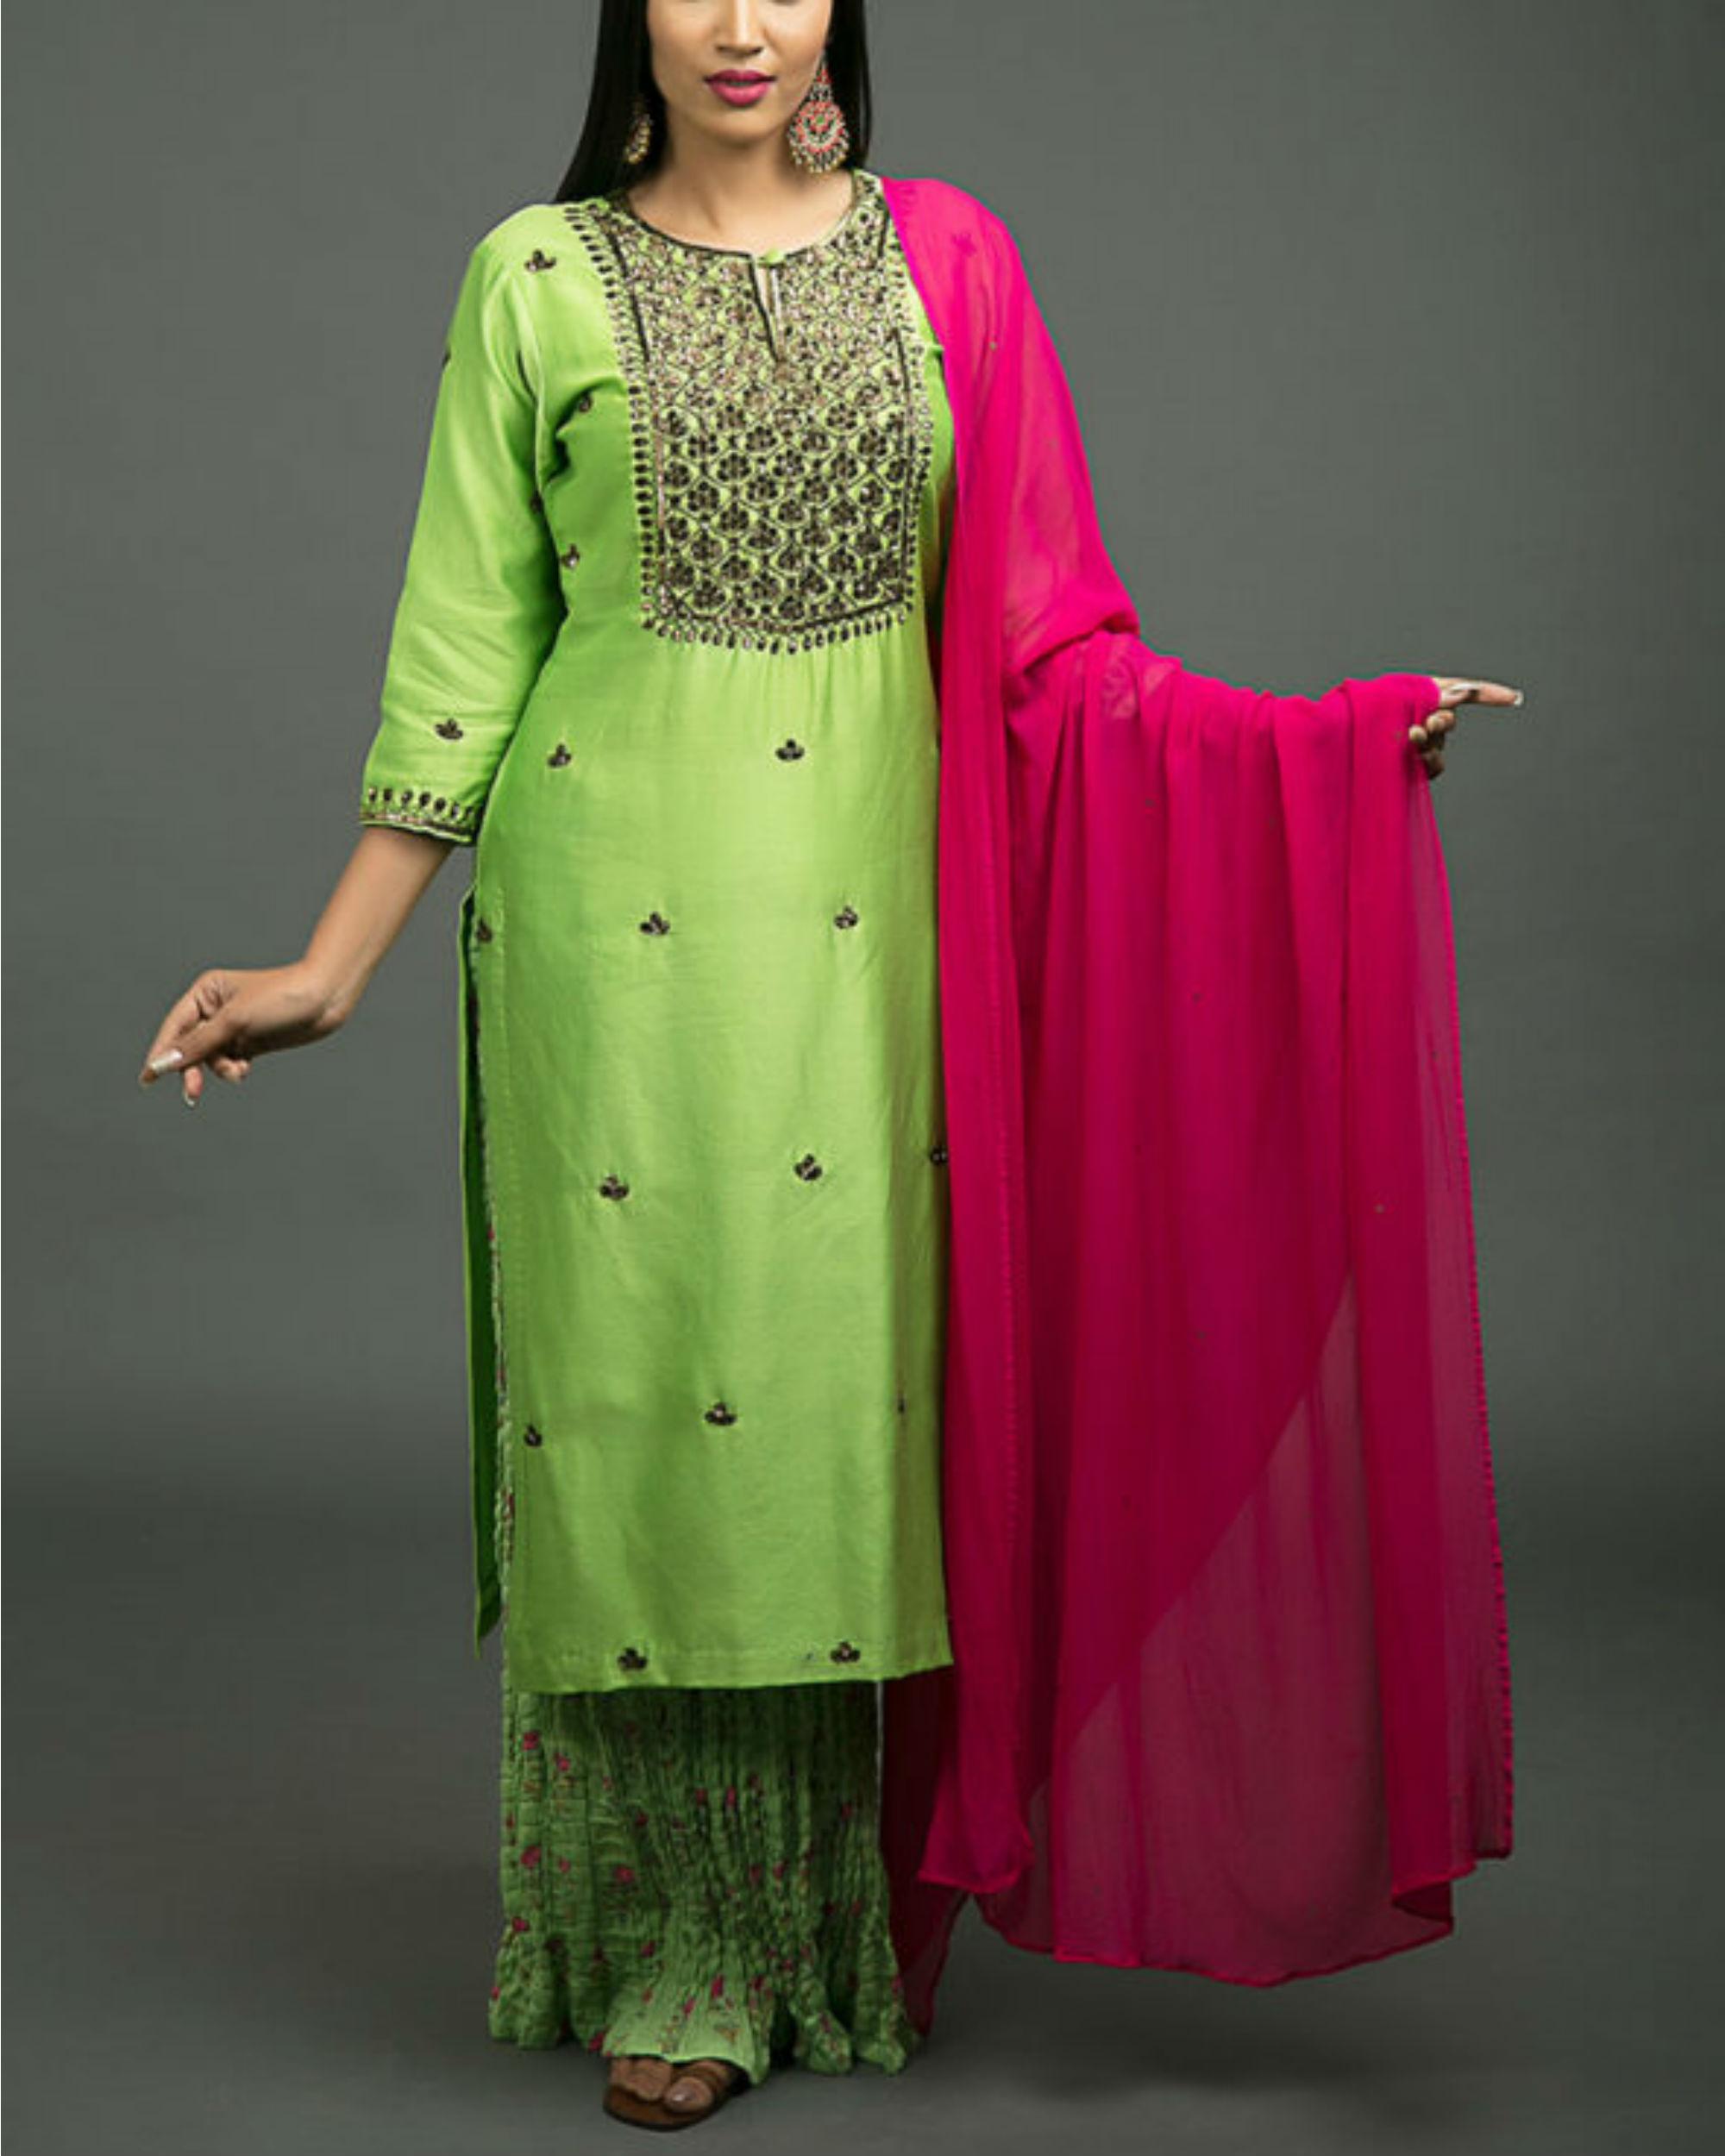 Hara peshawari embroidered kurta set with lime green dupatta